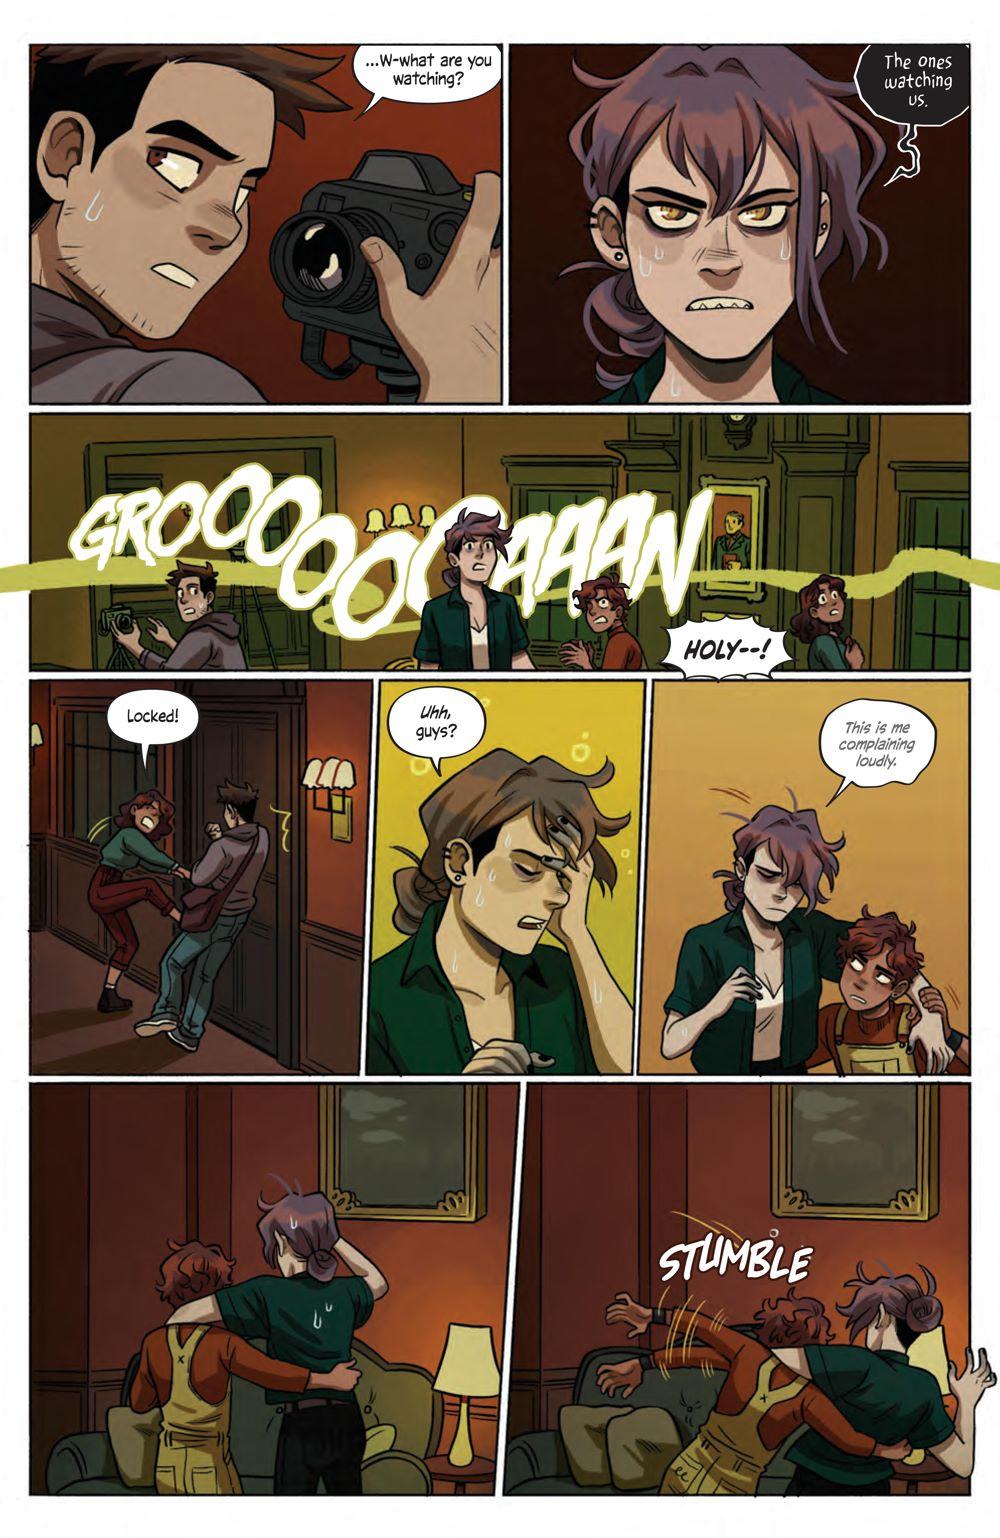 SpecterInspectors_003_PRESS_6 ComicList Previews: SPECTER INSPECTORS #3 (OF 5)